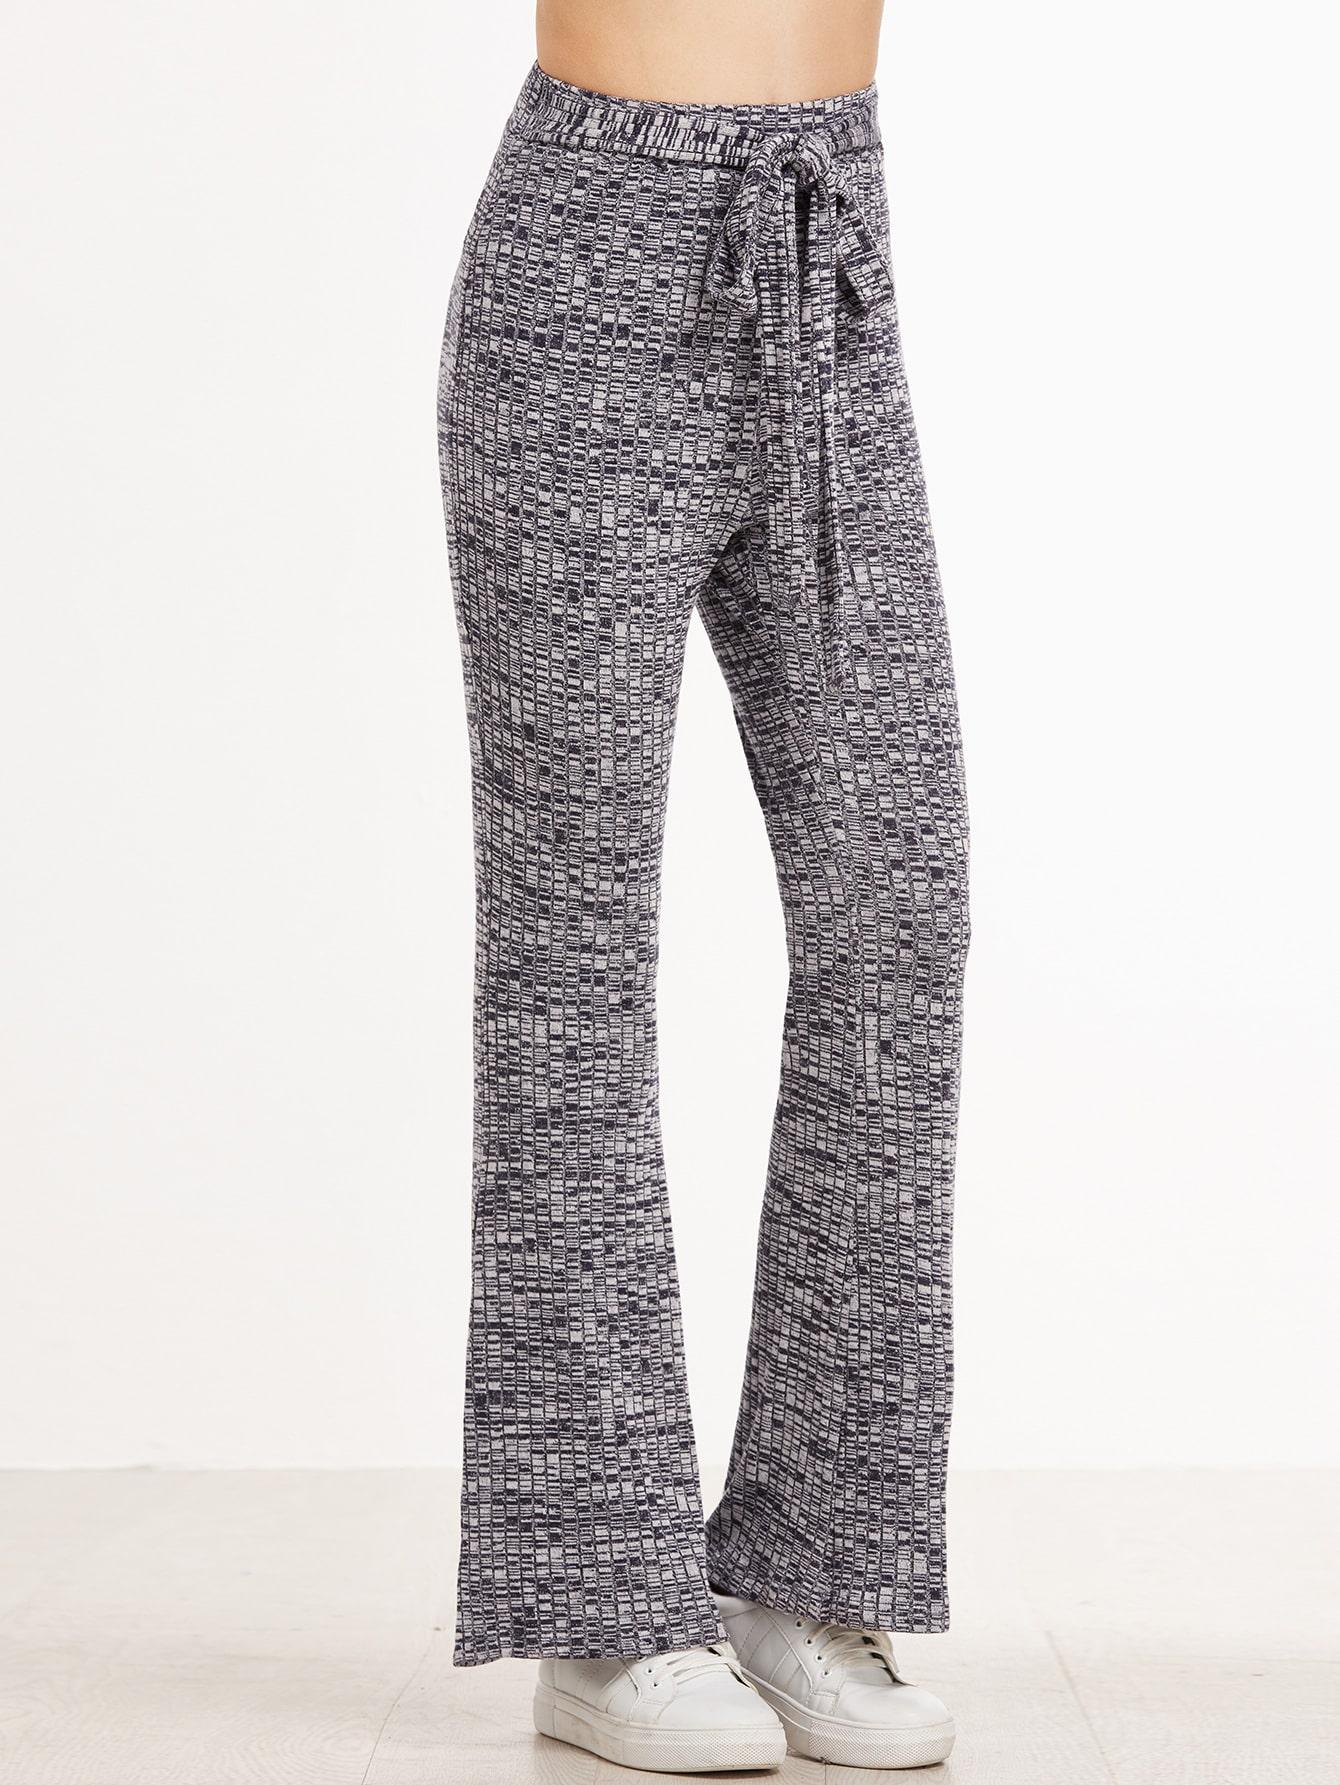 Grey Marled Ribbed Knit Belted Flared Pants pants161117701